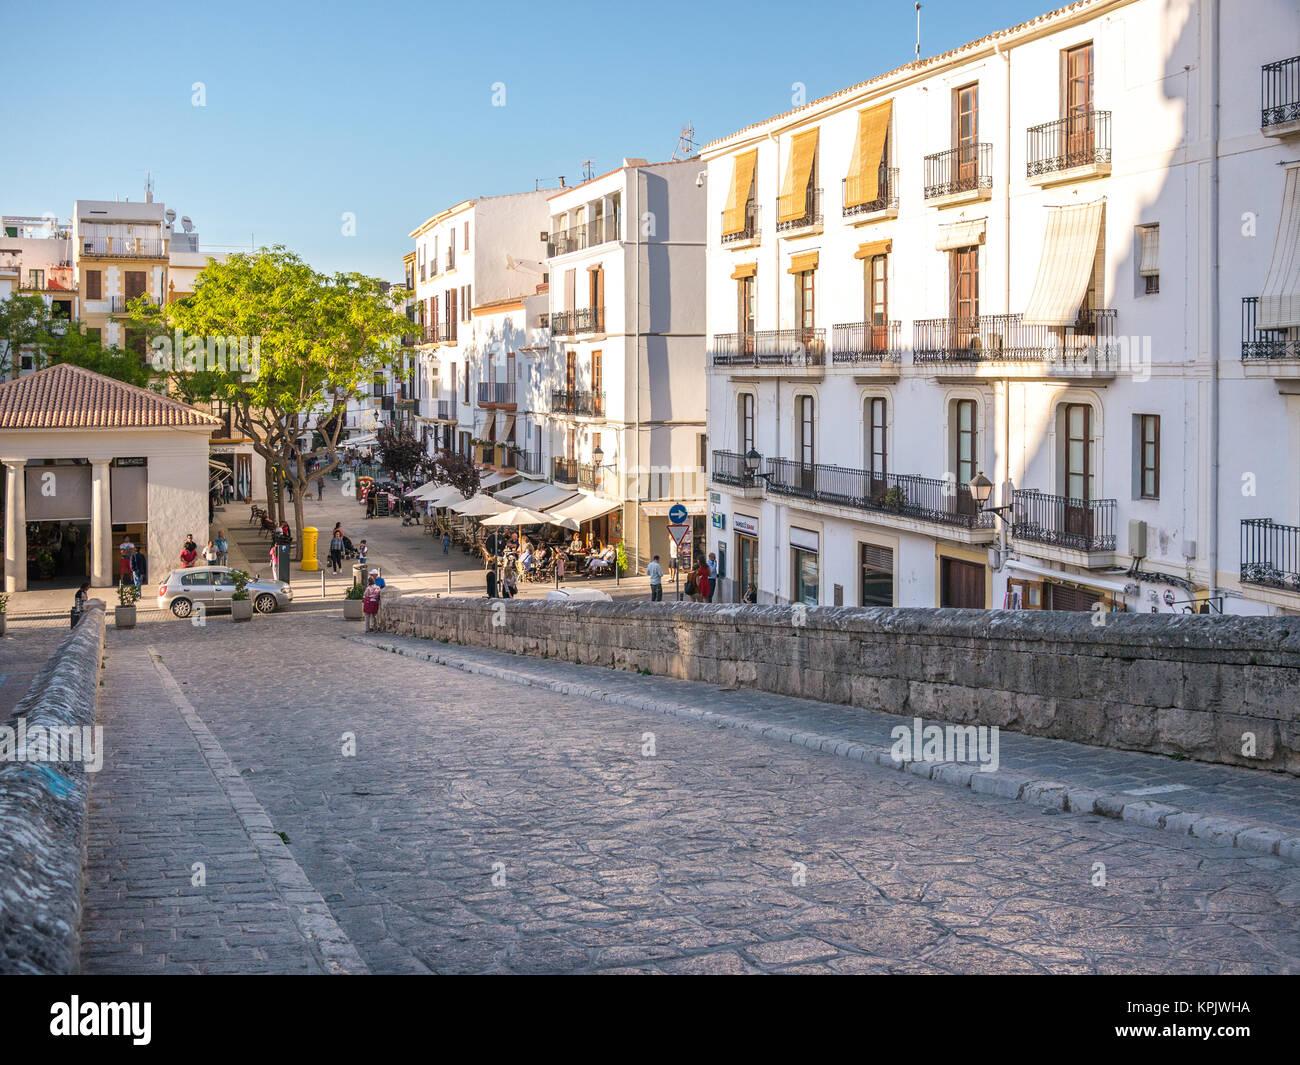 Ibiza, Spain - May 23, 2015. Entry to the Ibiza old town, called Dalt Vila. Stock Photo